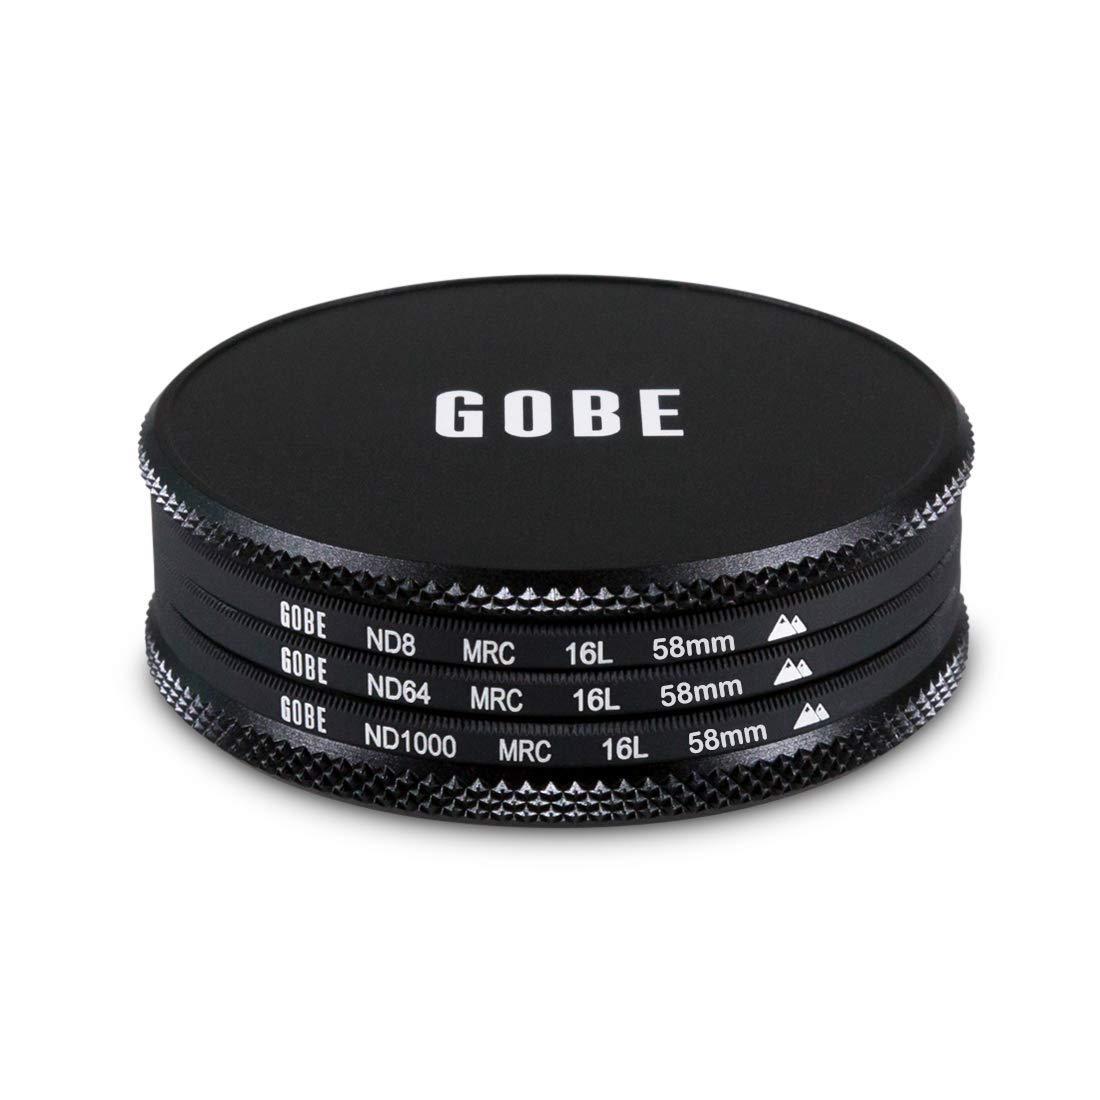 Gobe Kit Filtro ND 37mm MRC 16-strati: ND8 ND64 ND1000